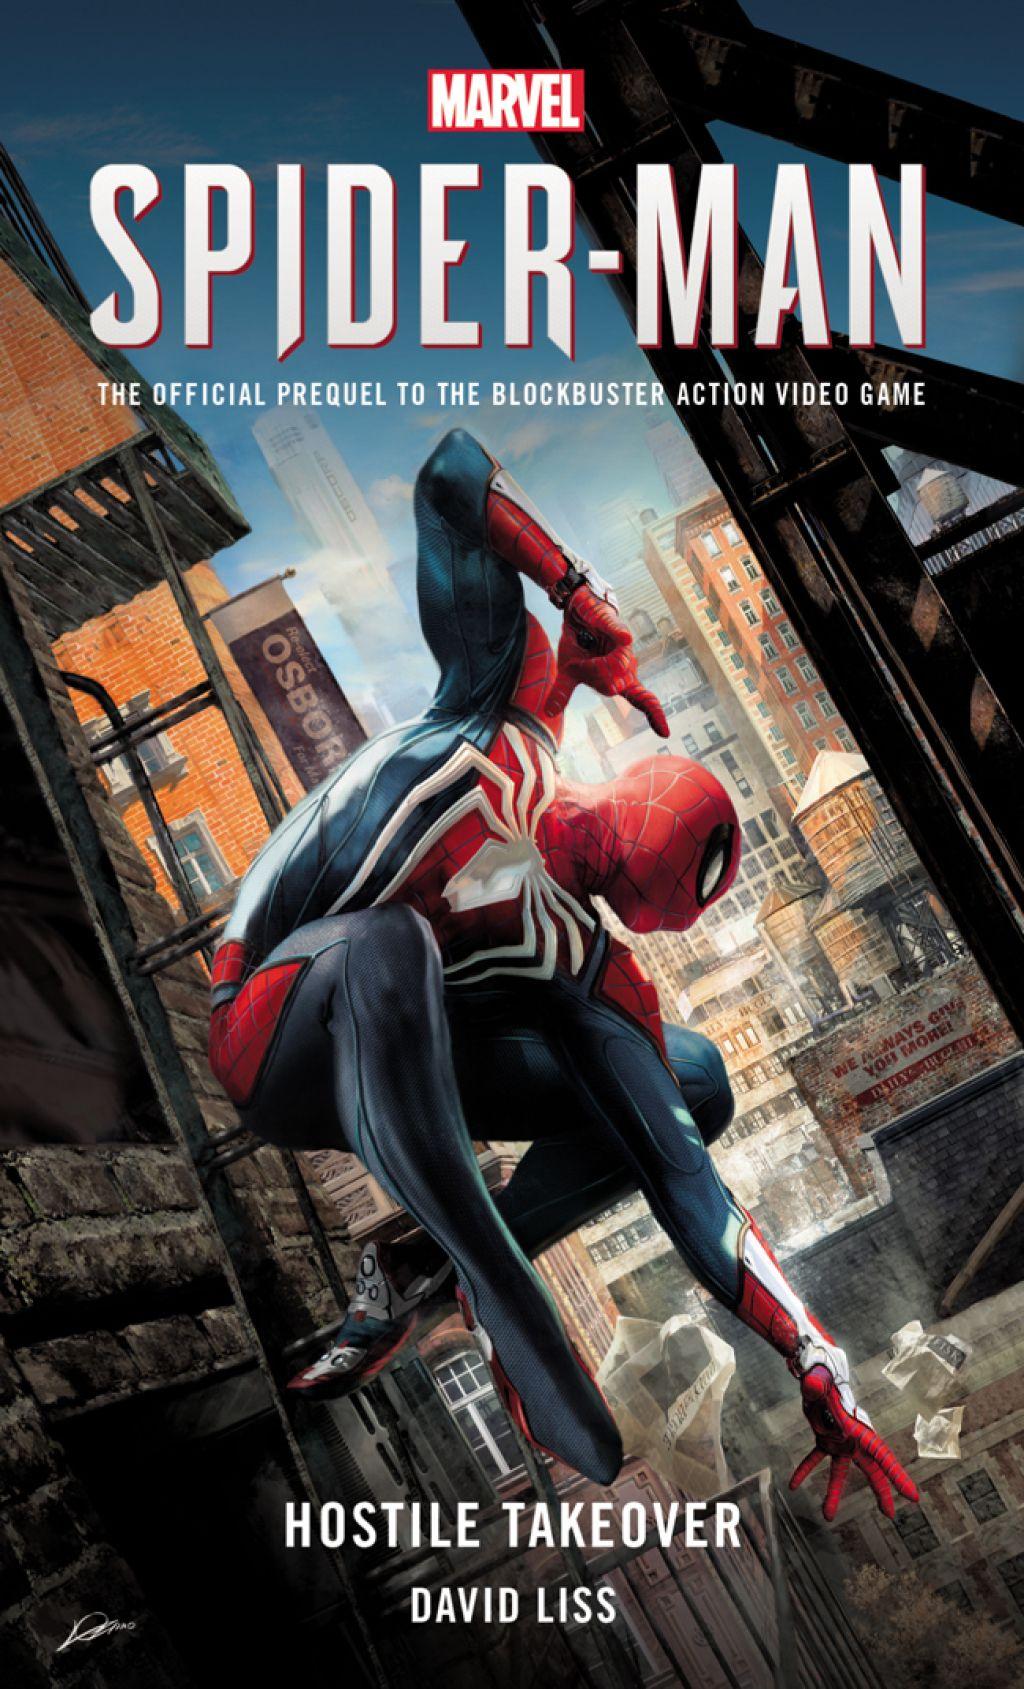 Marvel's SPIDER-MAN: Hostile Takeover (eBook) | Products in